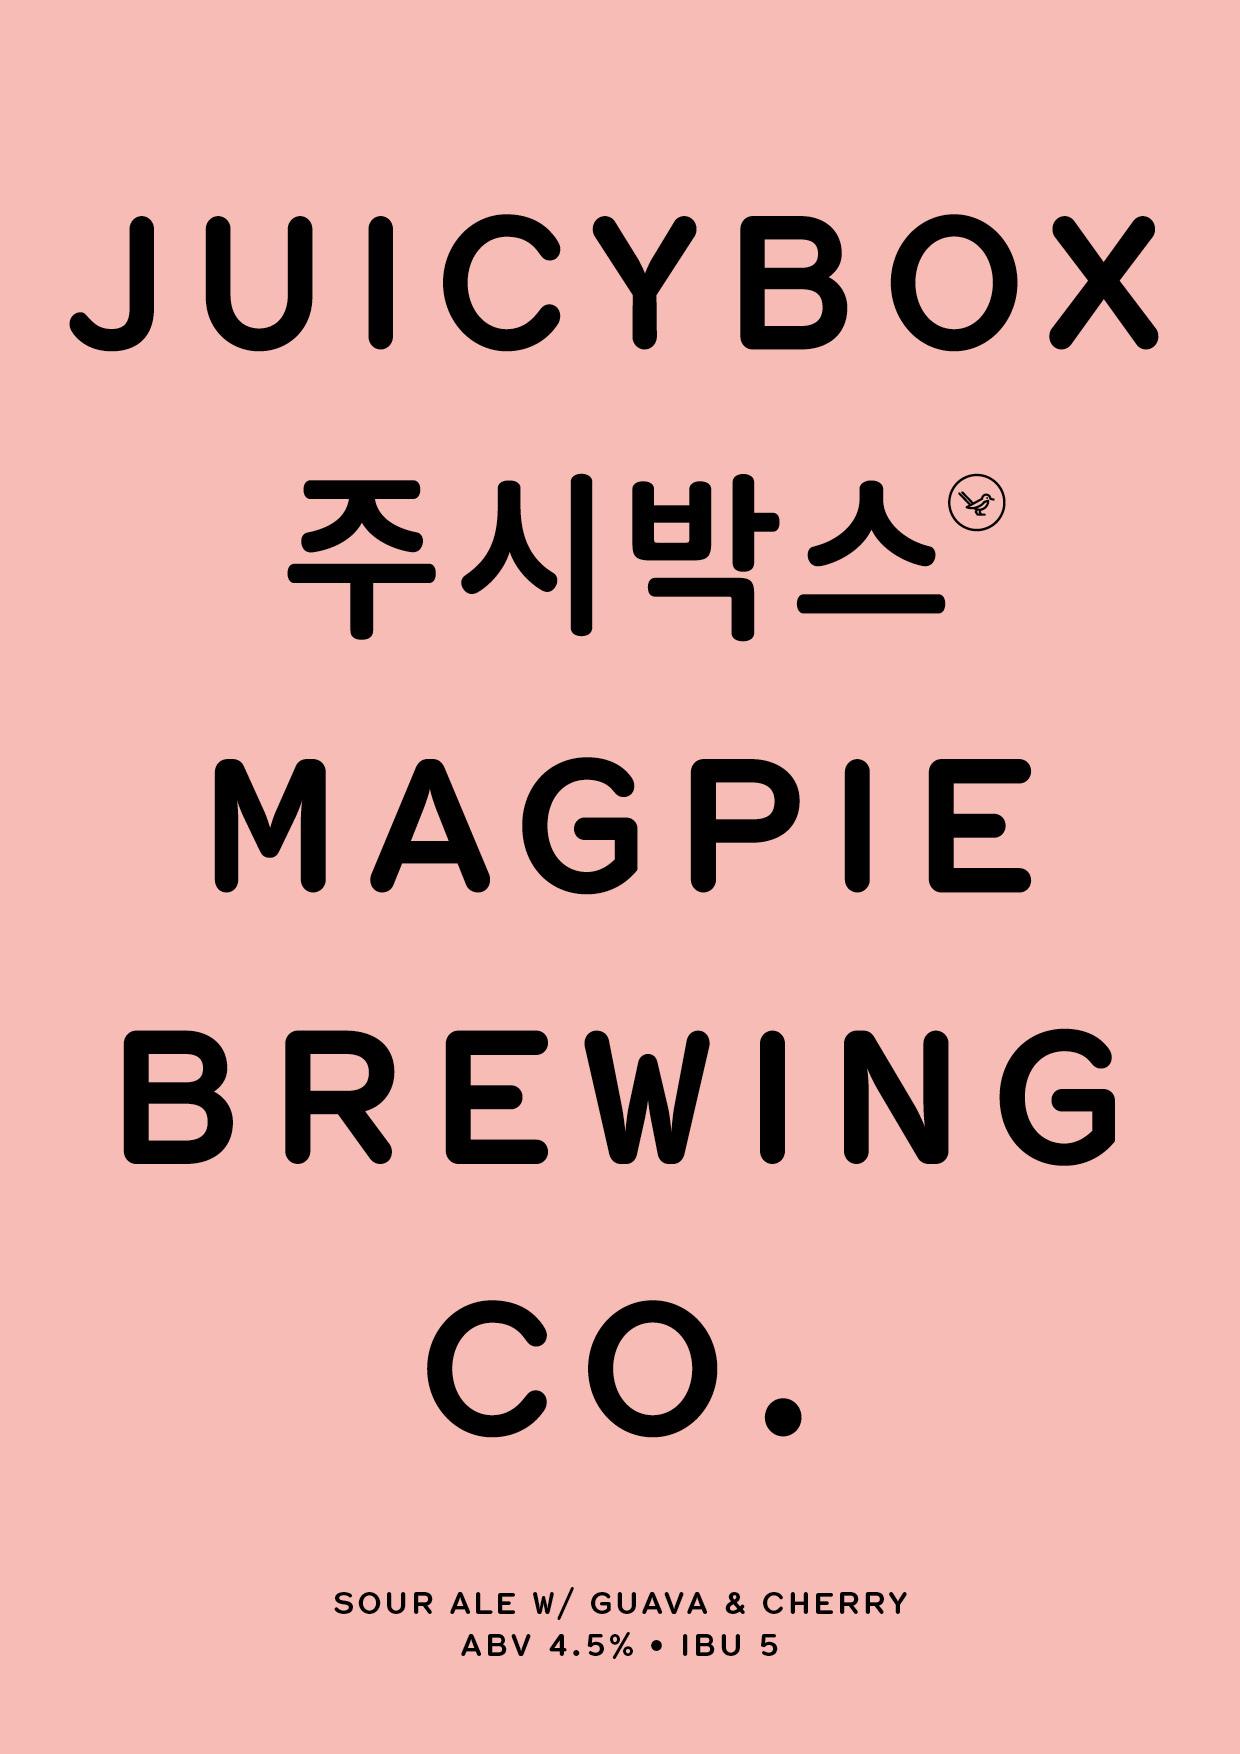 juicybox-01.jpg